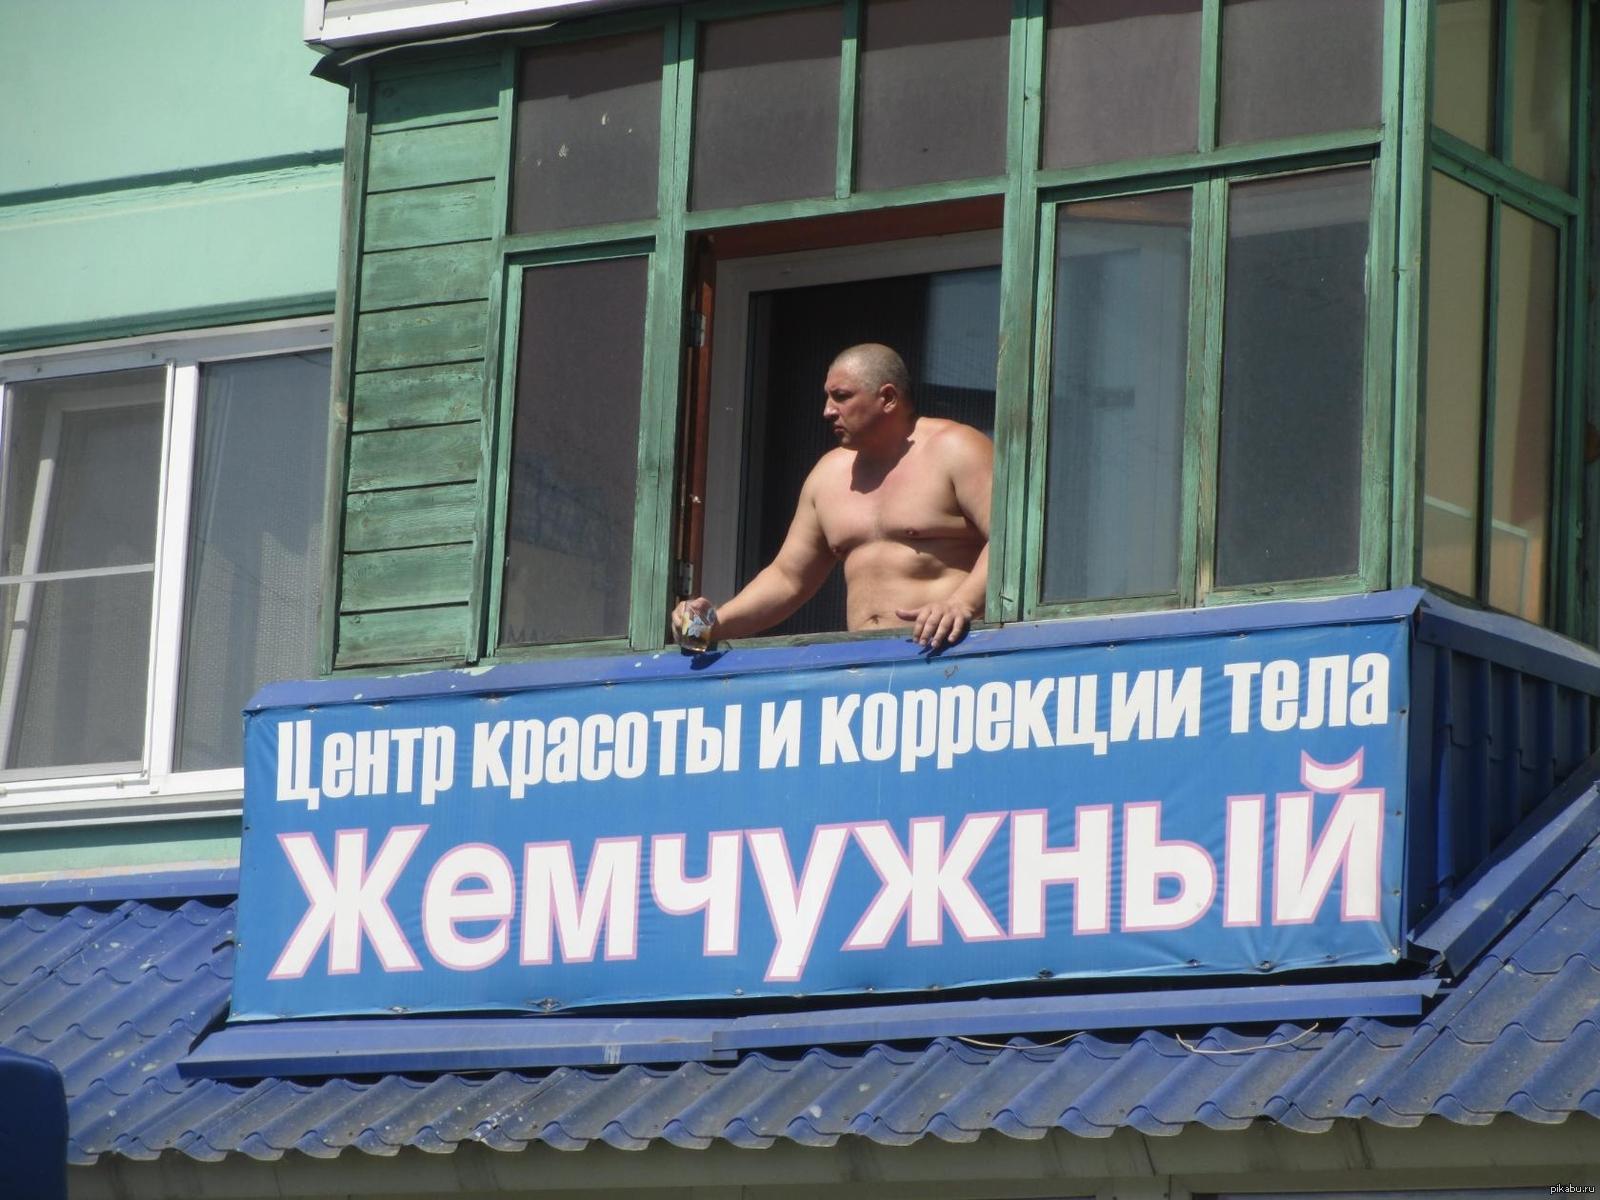 http://s2.uploads.ru/iEmoO.jpg